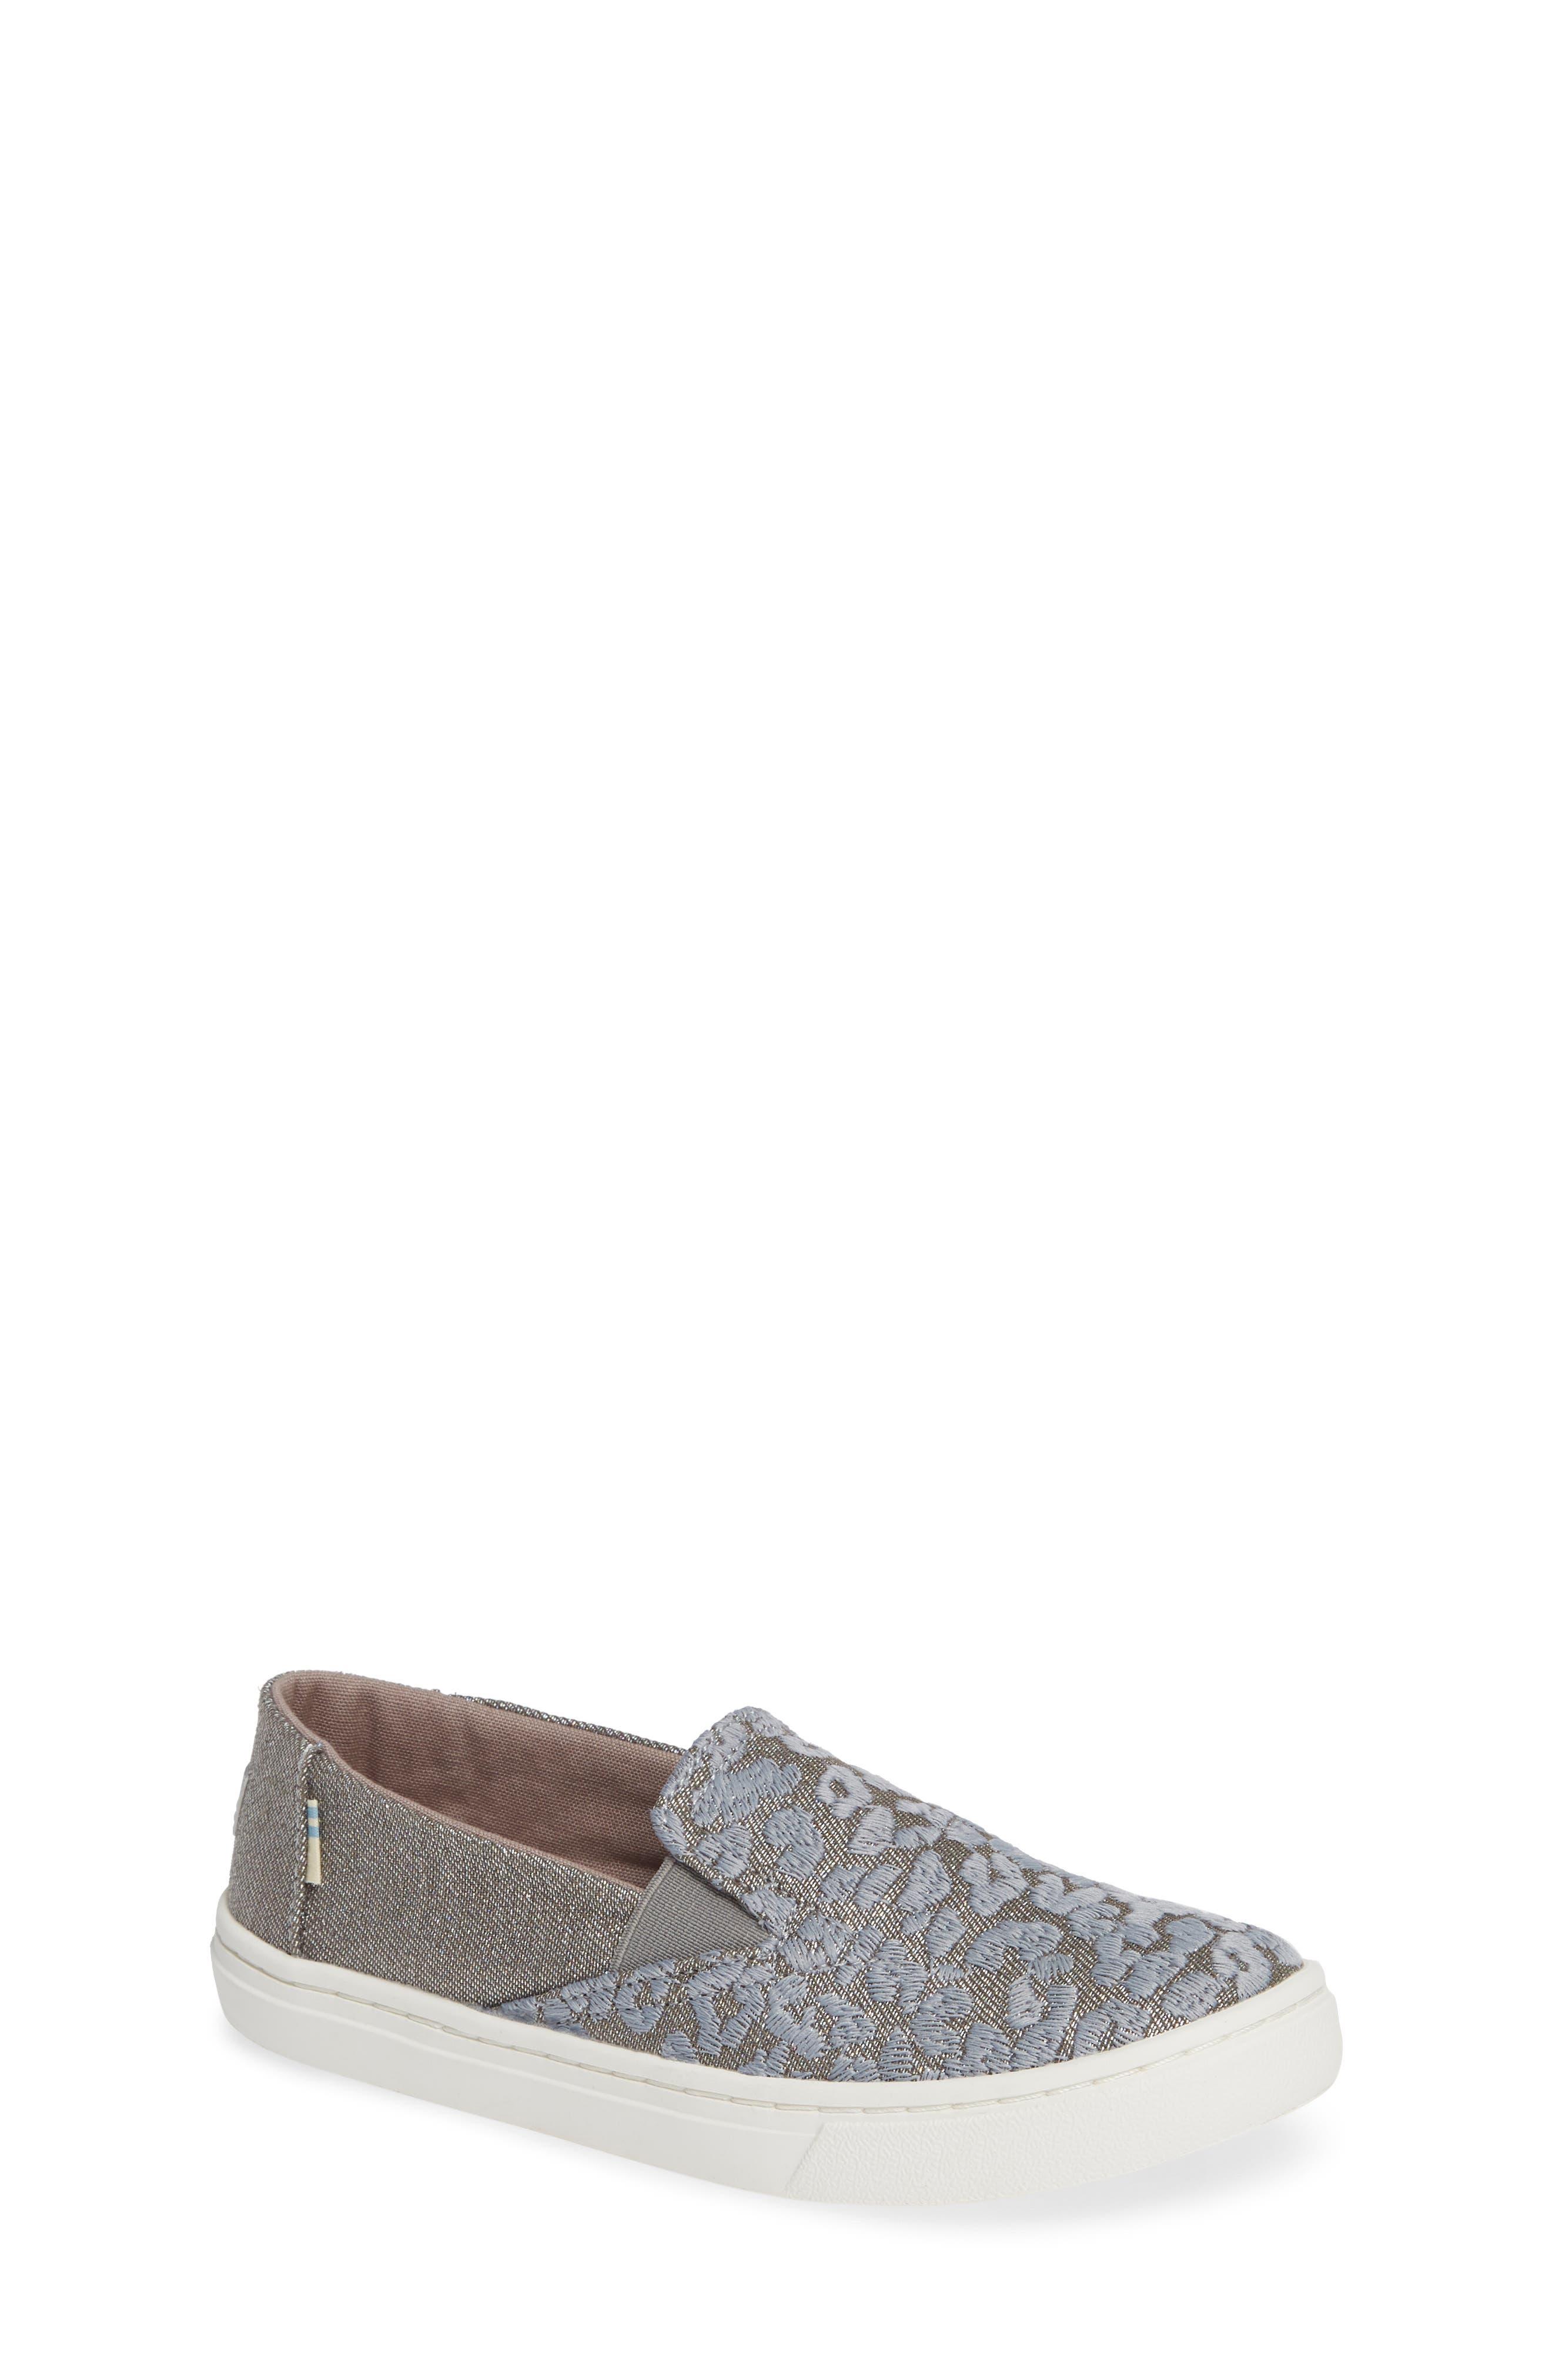 Luca Slip-On Sneaker,                         Main,                         color, NEUTRAL GRAY CHEETAH/ TWILL